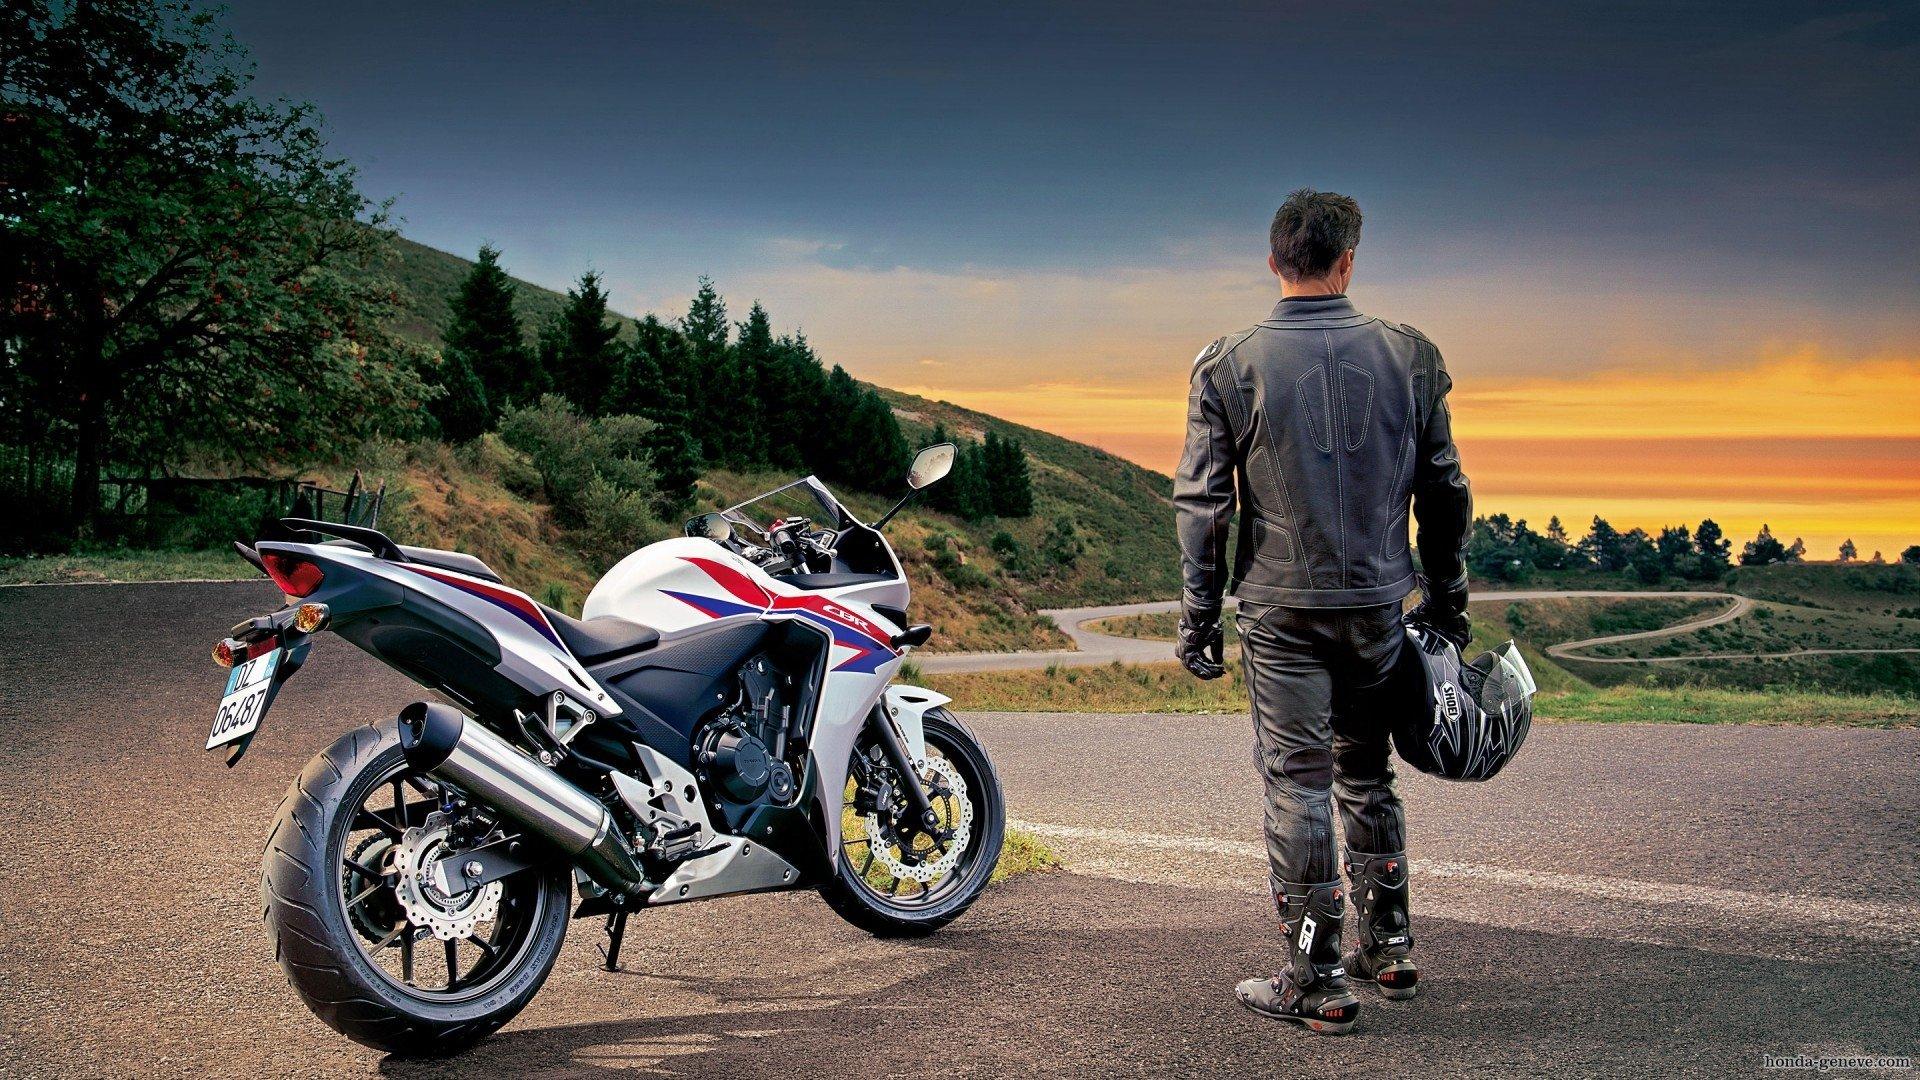 Honda Cbr Motorcycle 4k Hd Desktop Wallpaper For 4k Ultra: Honda CBR 500R Full HD Wallpaper And Background Image